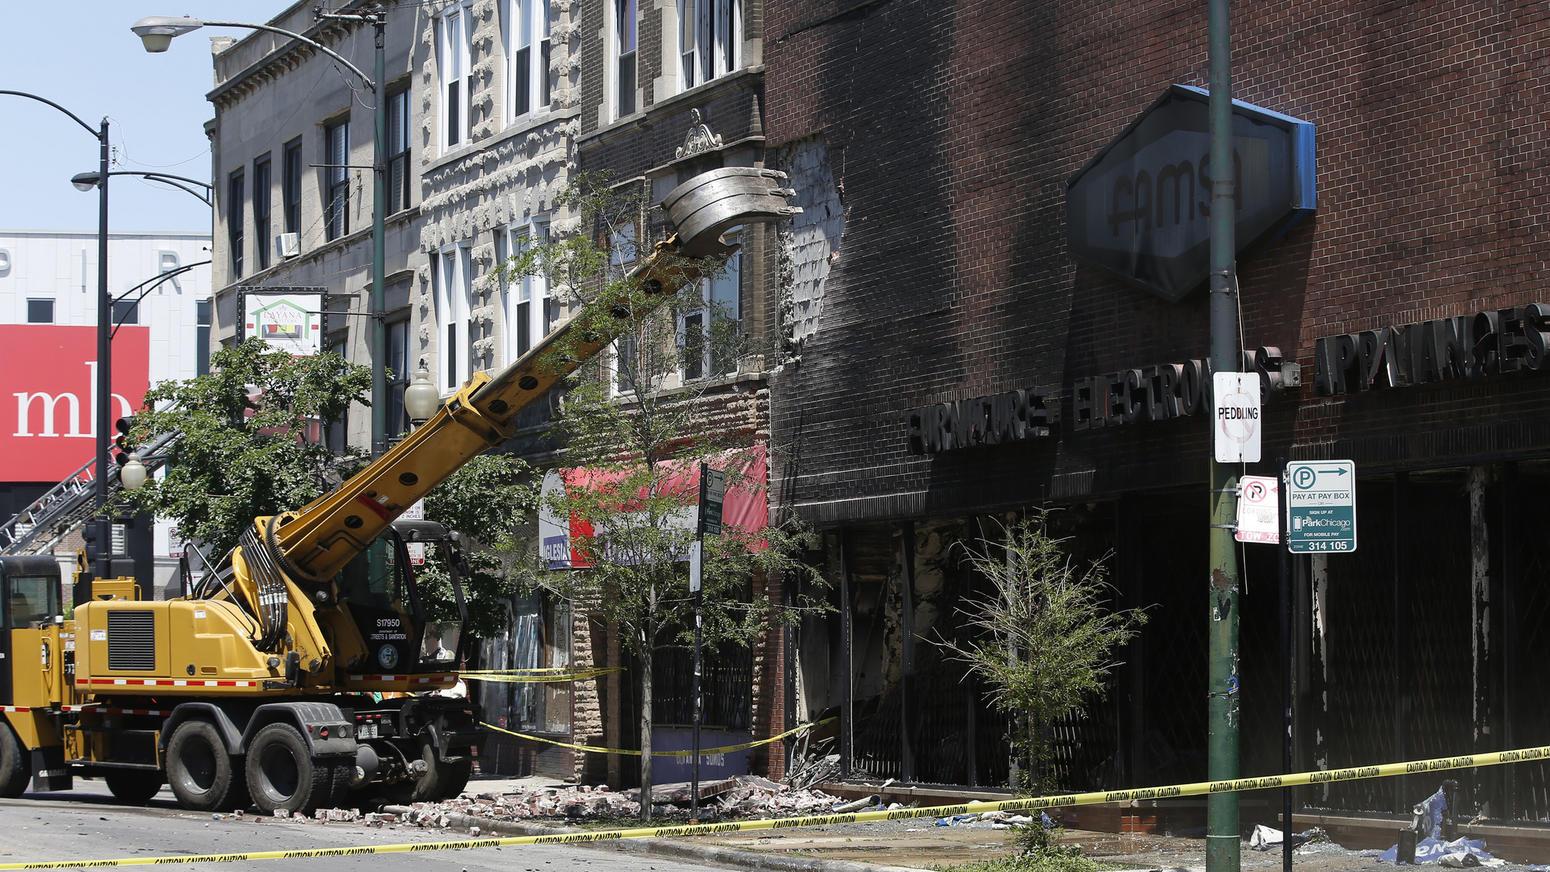 MEC&F Expert Engineers : 3-alarm fire destroys the Famsa Furniture